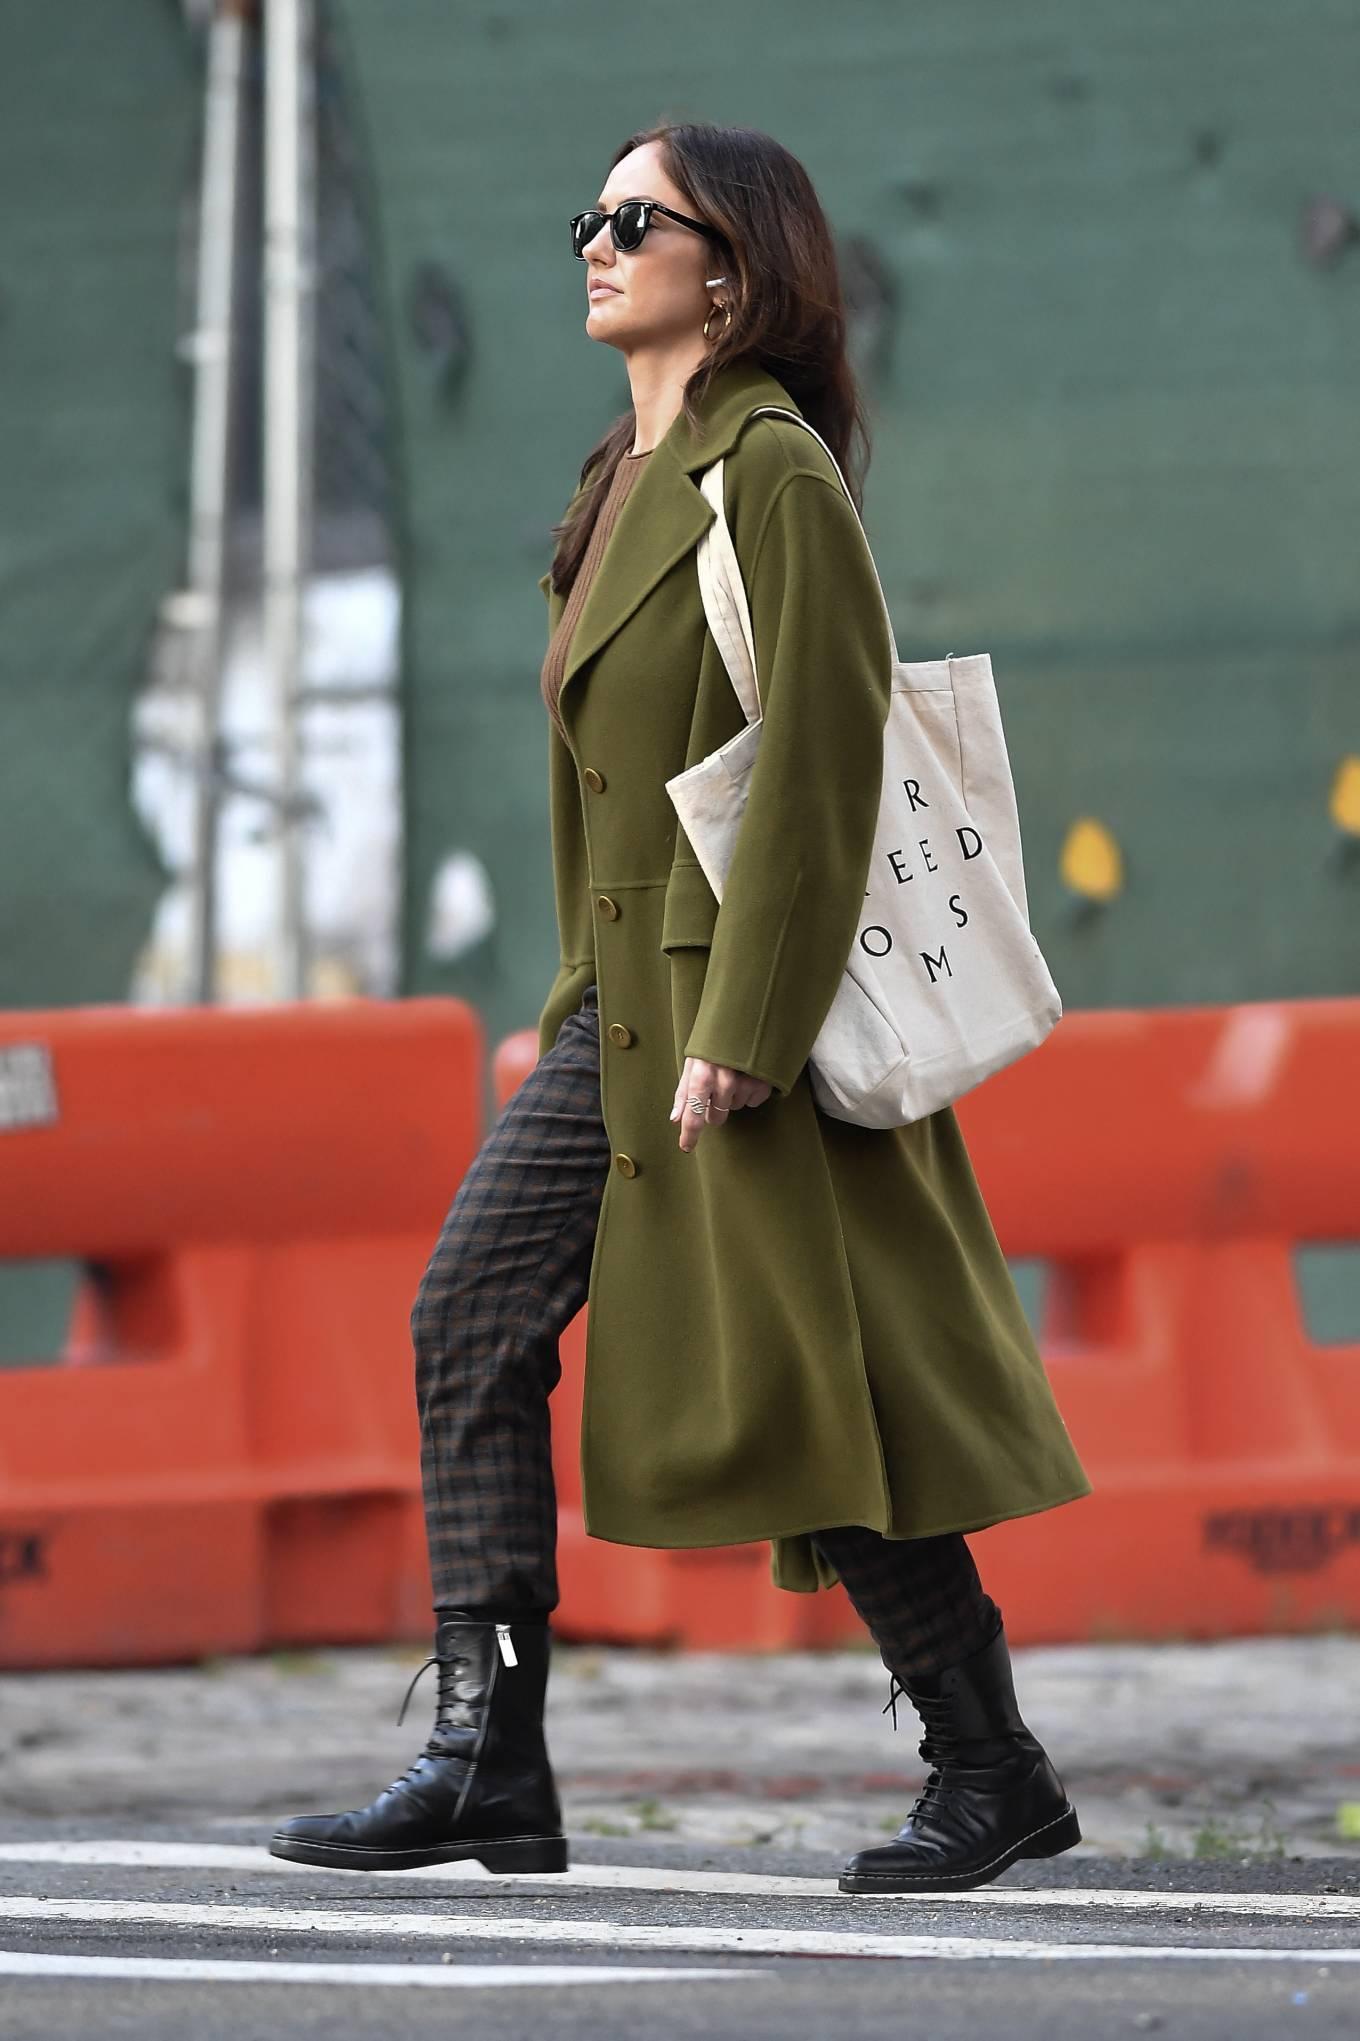 Minka Kelly 2021 : Minka Kelly – In olive green runs errands in New York-22